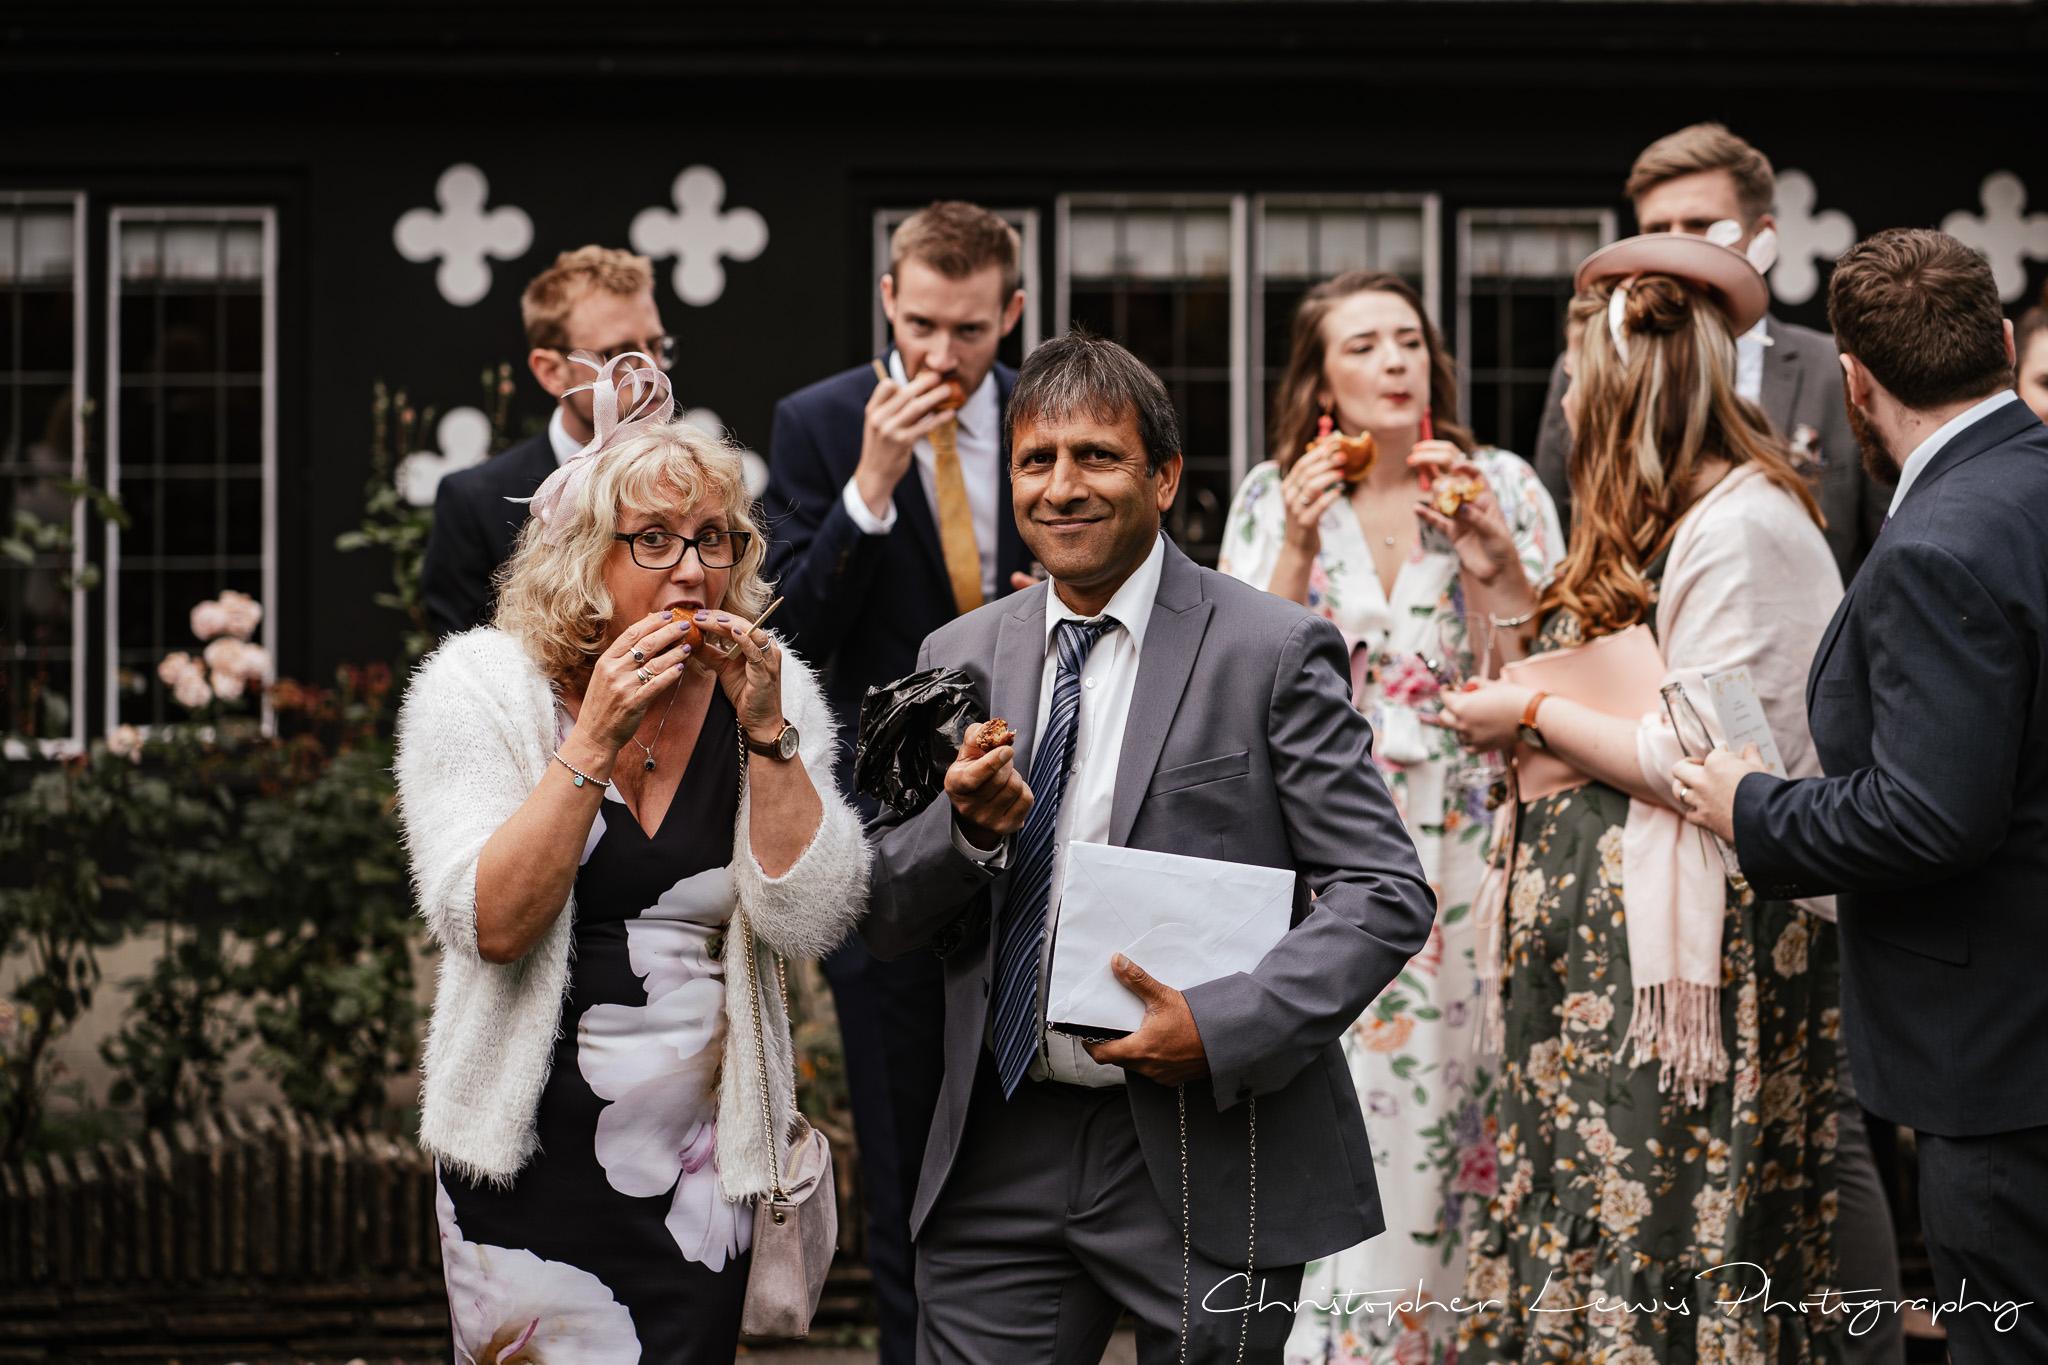 Samlesbury Hall Wedding canapés